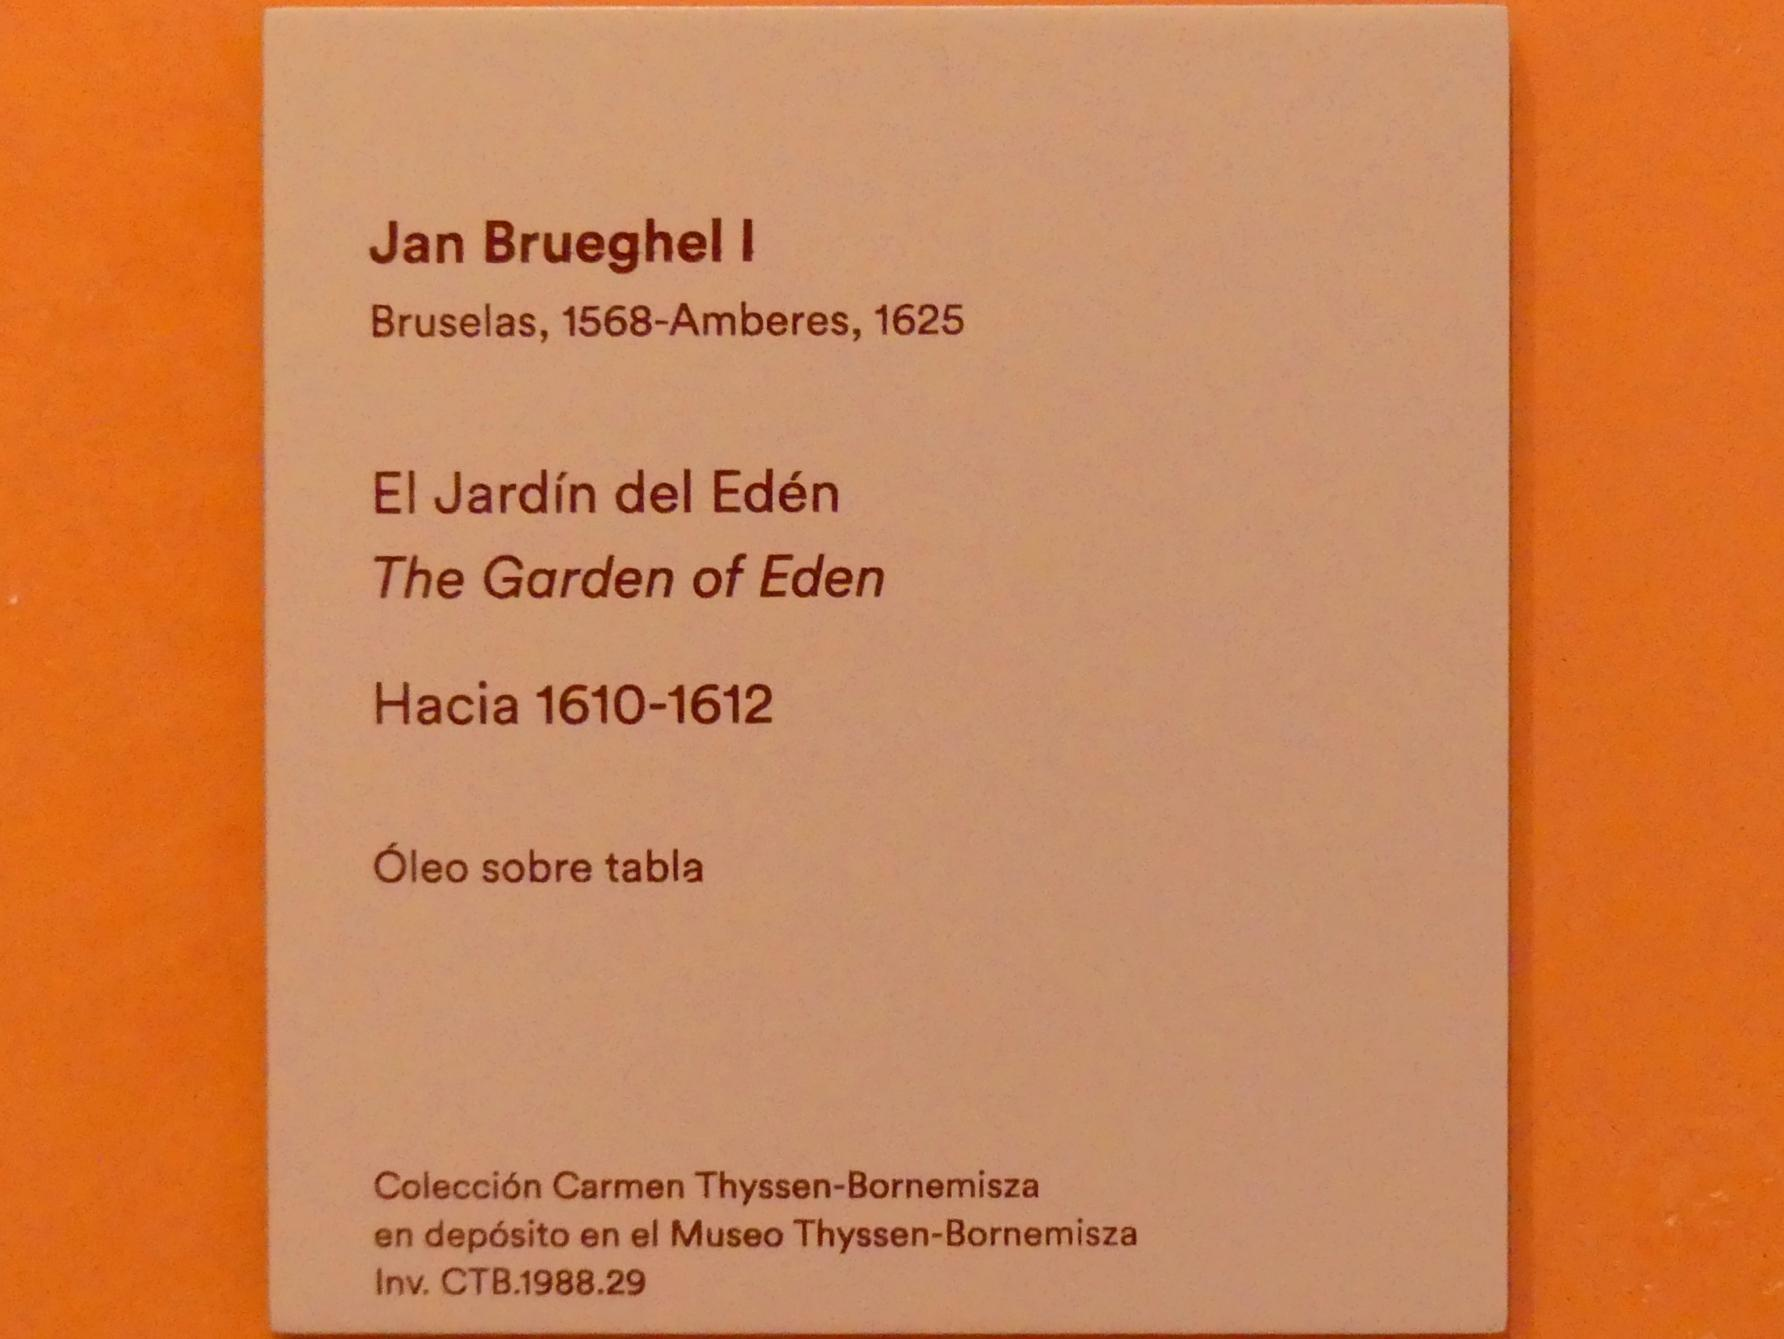 Jan Brueghel der Ältere (Blumenbrueghel): Der Garten Eden, um 1610 - 1612, Bild 4/4